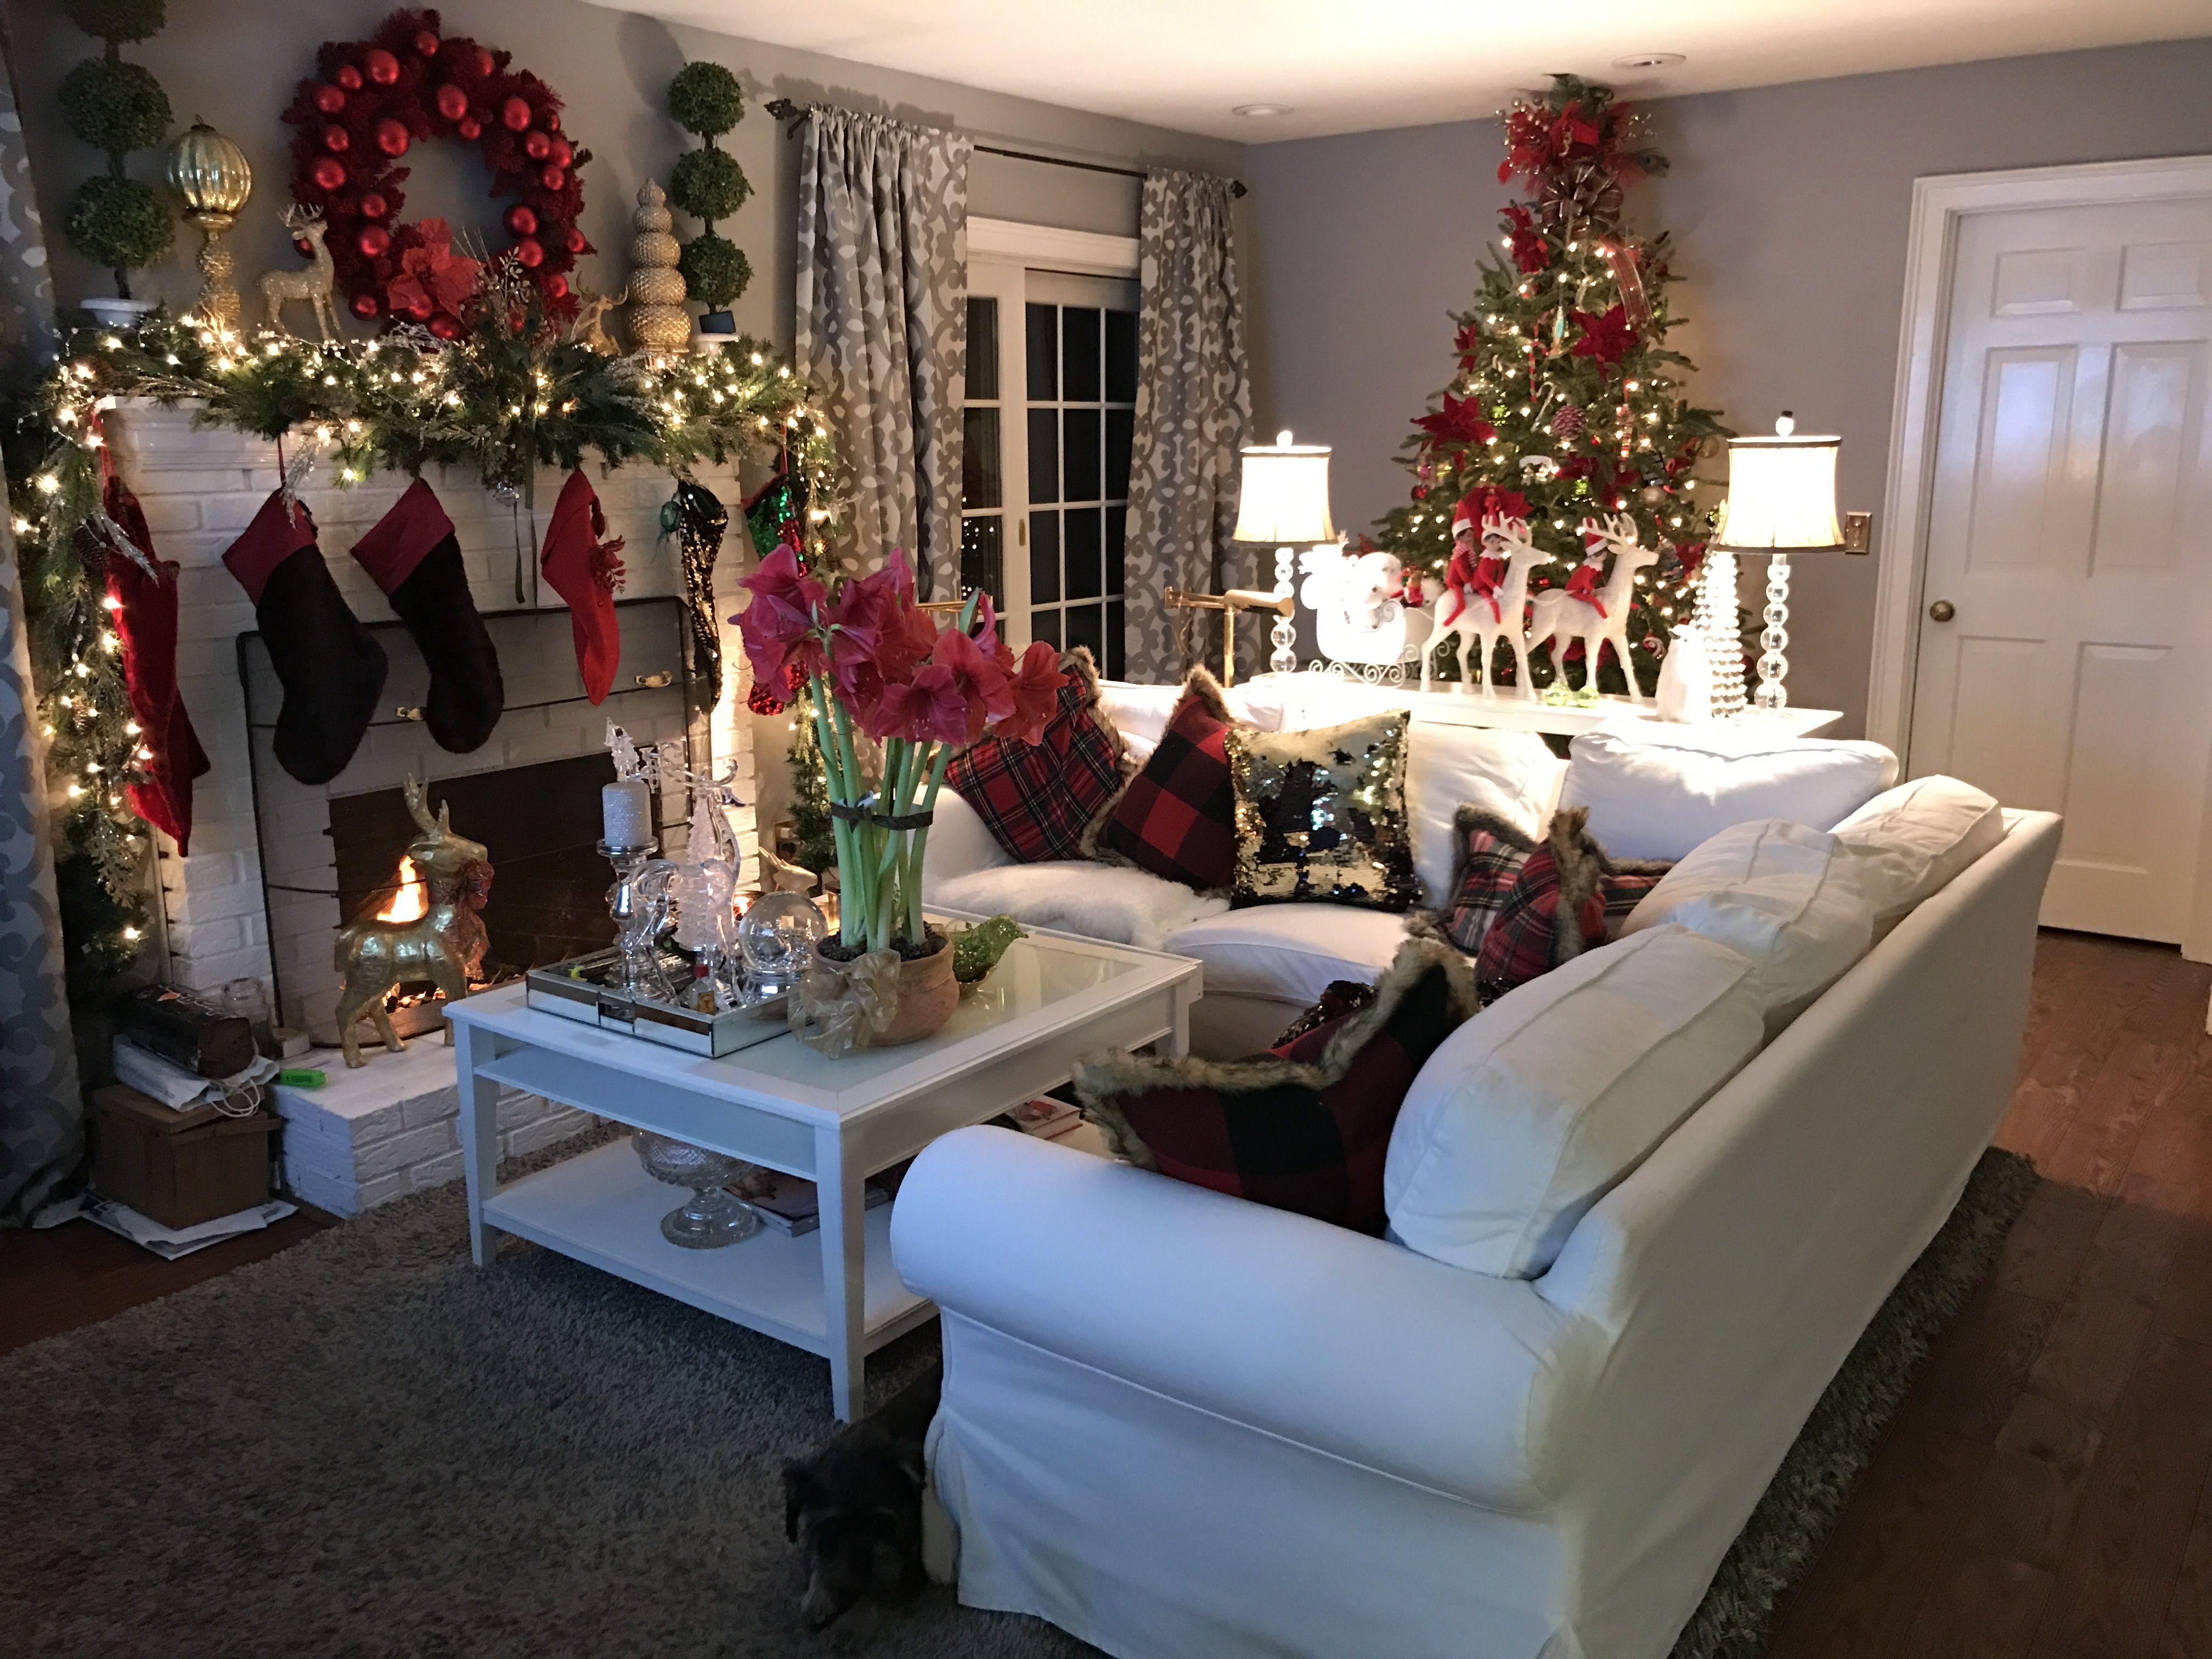 Fantastic Christmas Tree Decor Poinsettia Ornaments With Ikea Ektorp Inzonedesignstudio Interior Chair Design Inzonedesignstudiocom